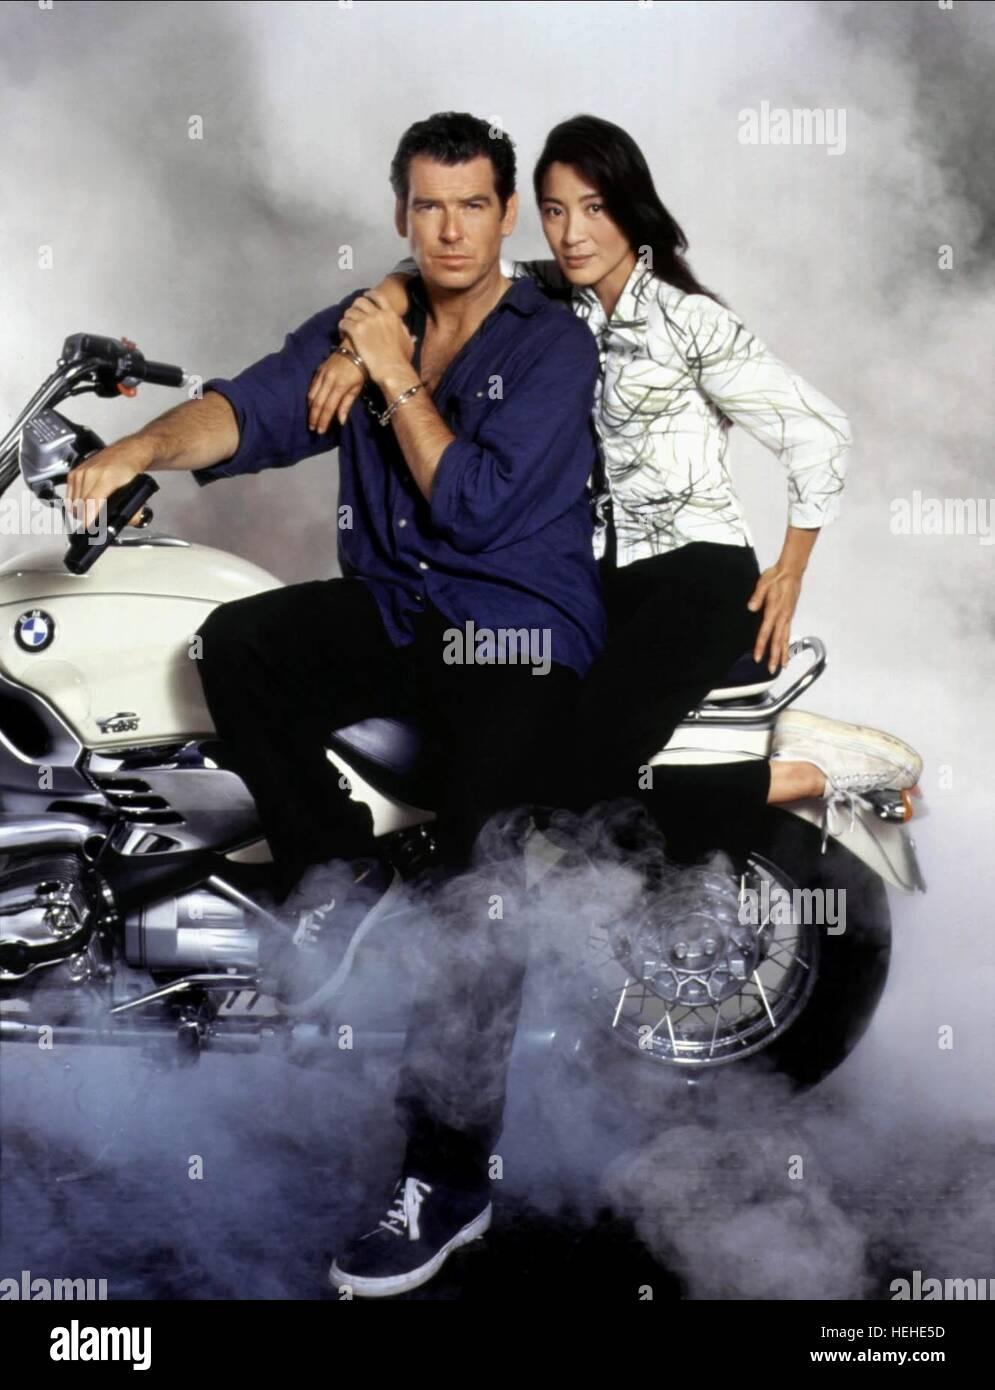 Pierce Brosnan Amp Michelle Yeoh James Bond Tomorrow Never Dies 1997 Stock Photo 129462073 Alamy